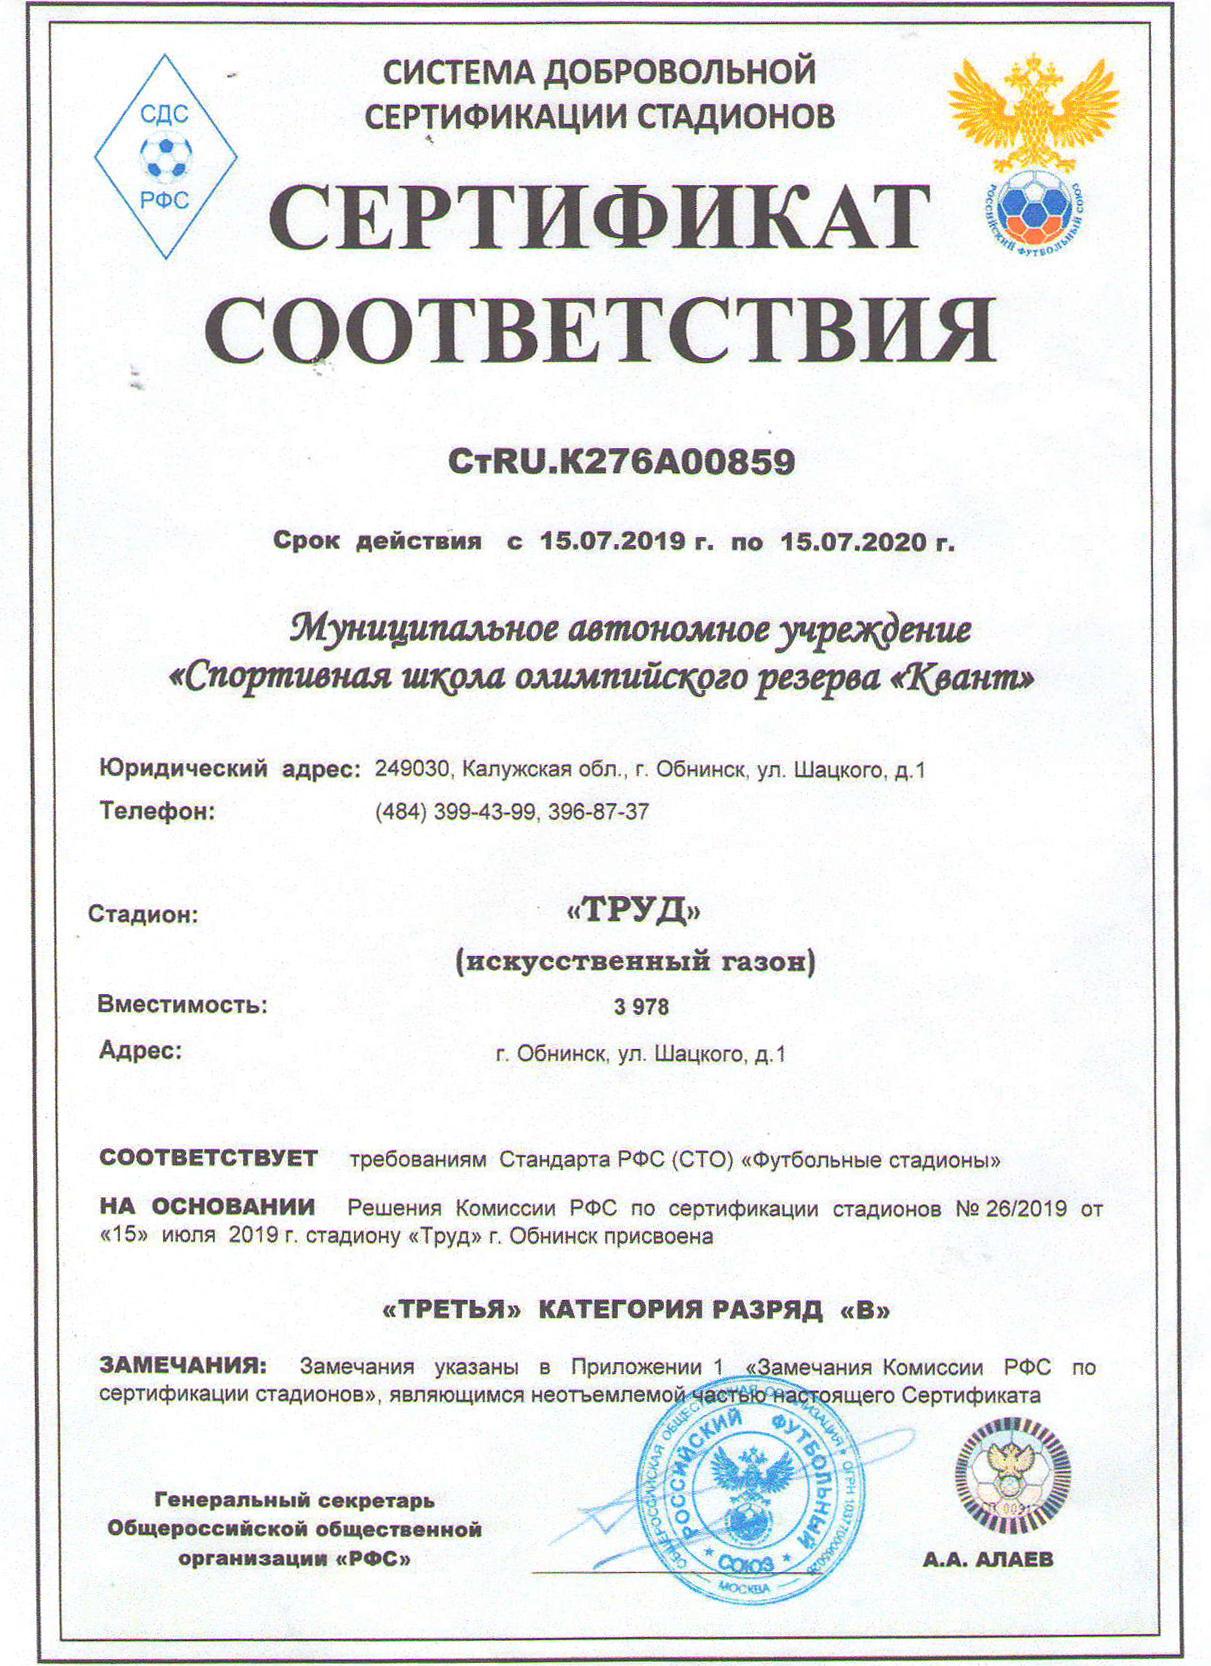 сертификат рфс